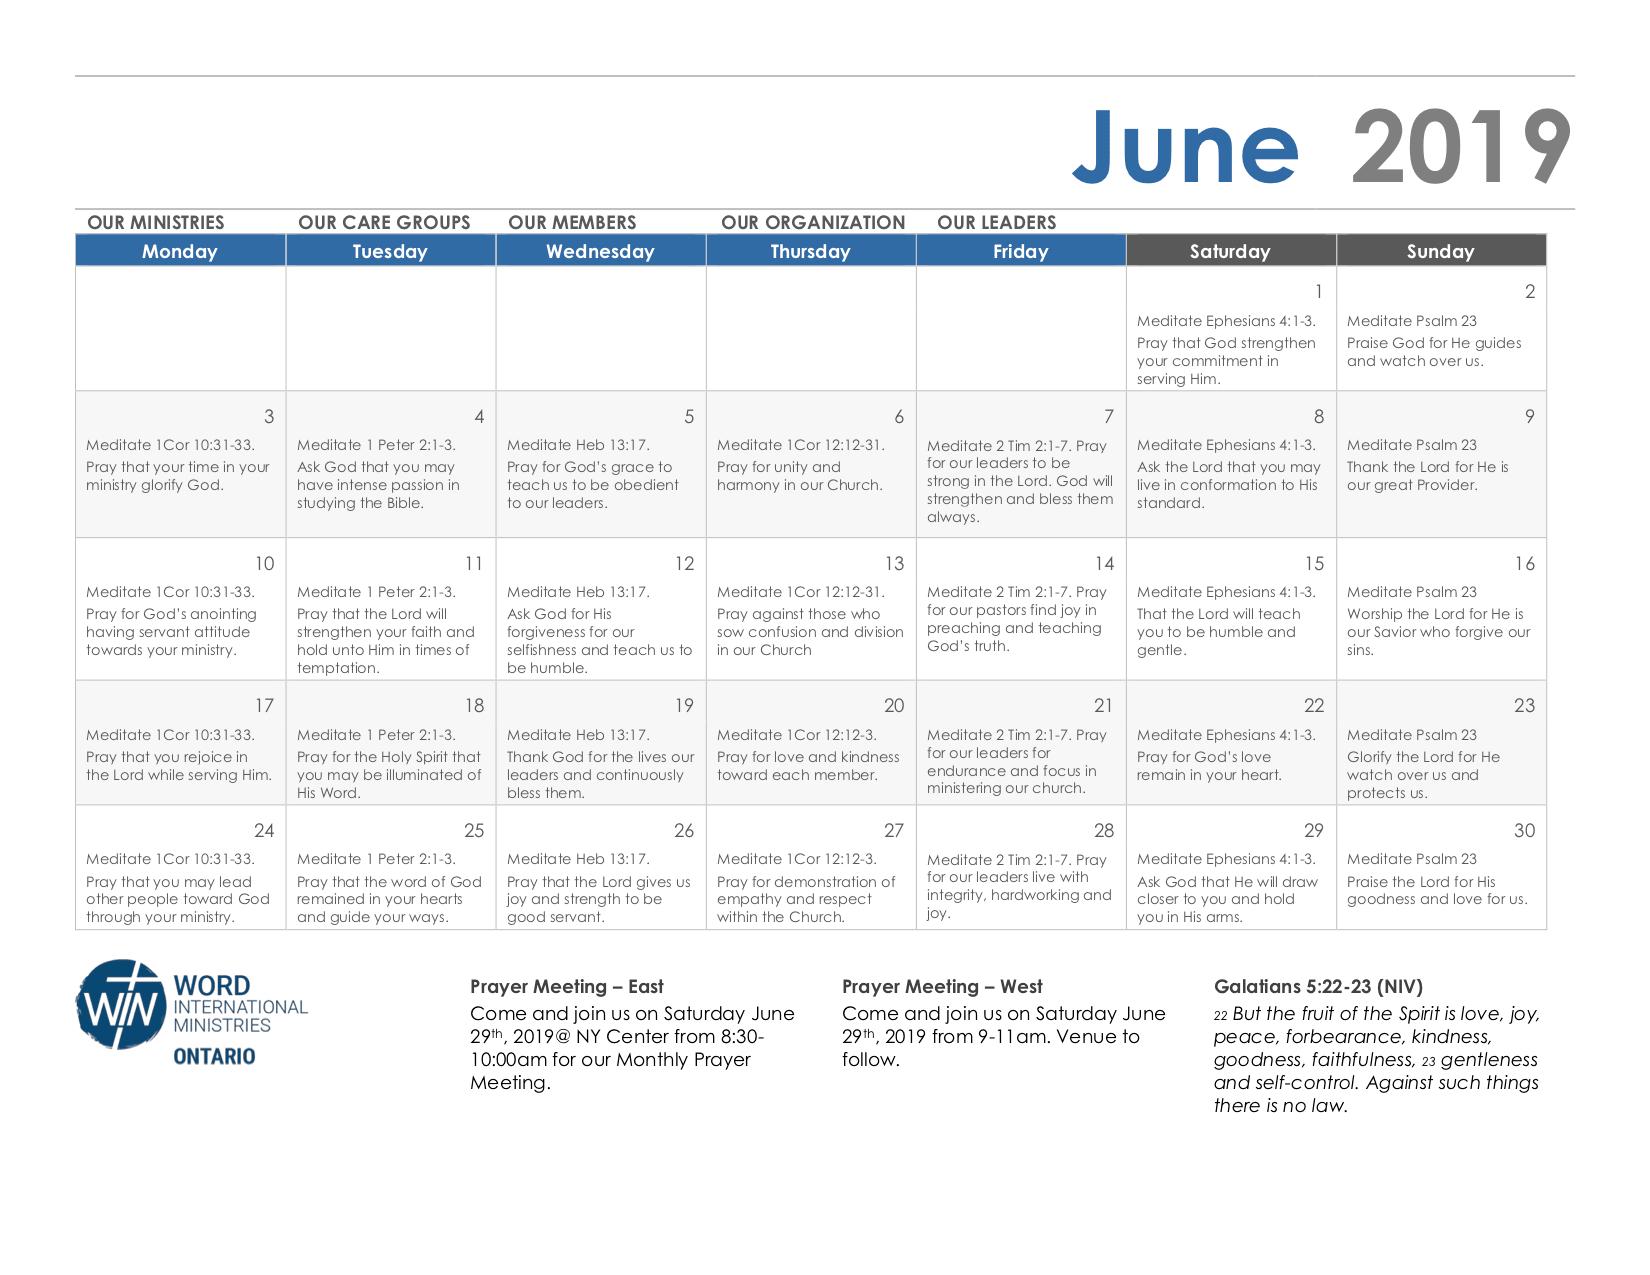 June 2019 Calendar Min – Word International Ministries Of Ontario Calendar 2019 Ontario